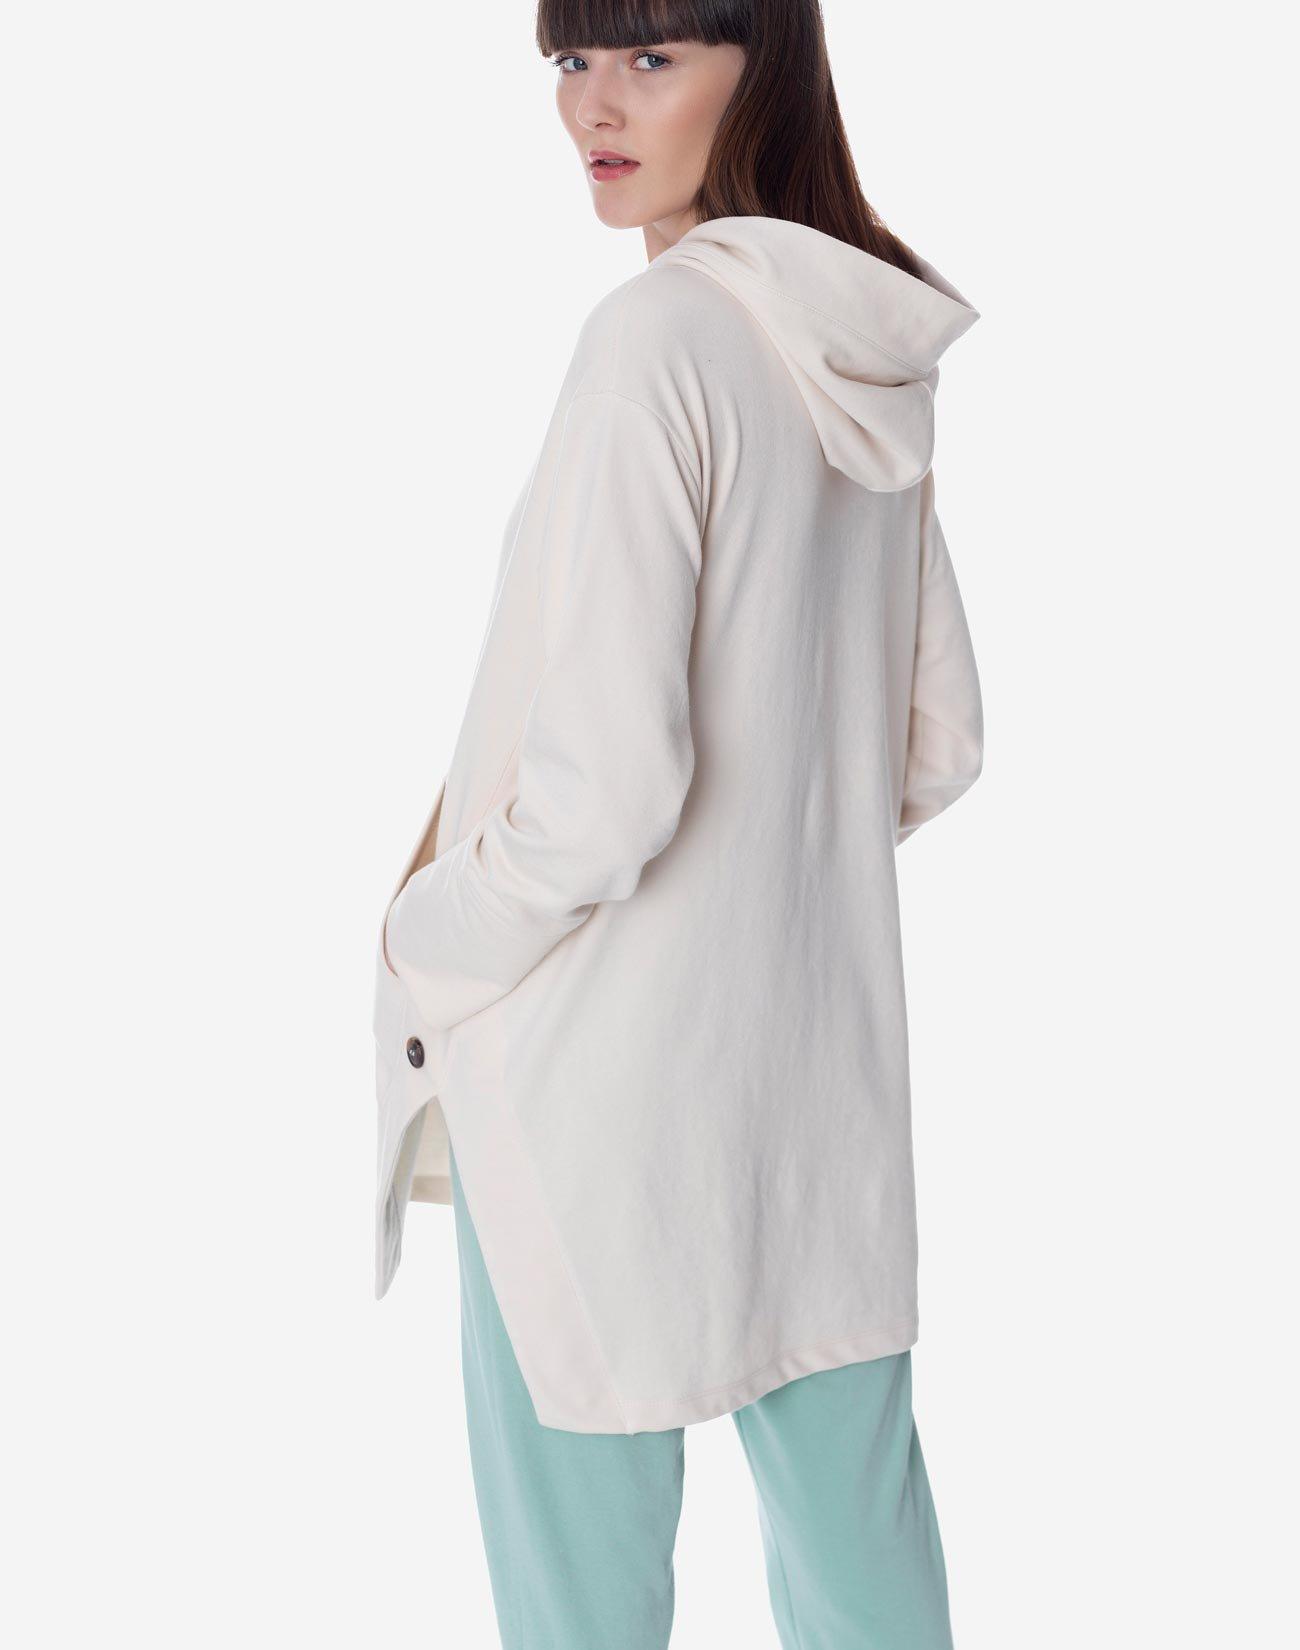 Hooded sweatshirt with openings